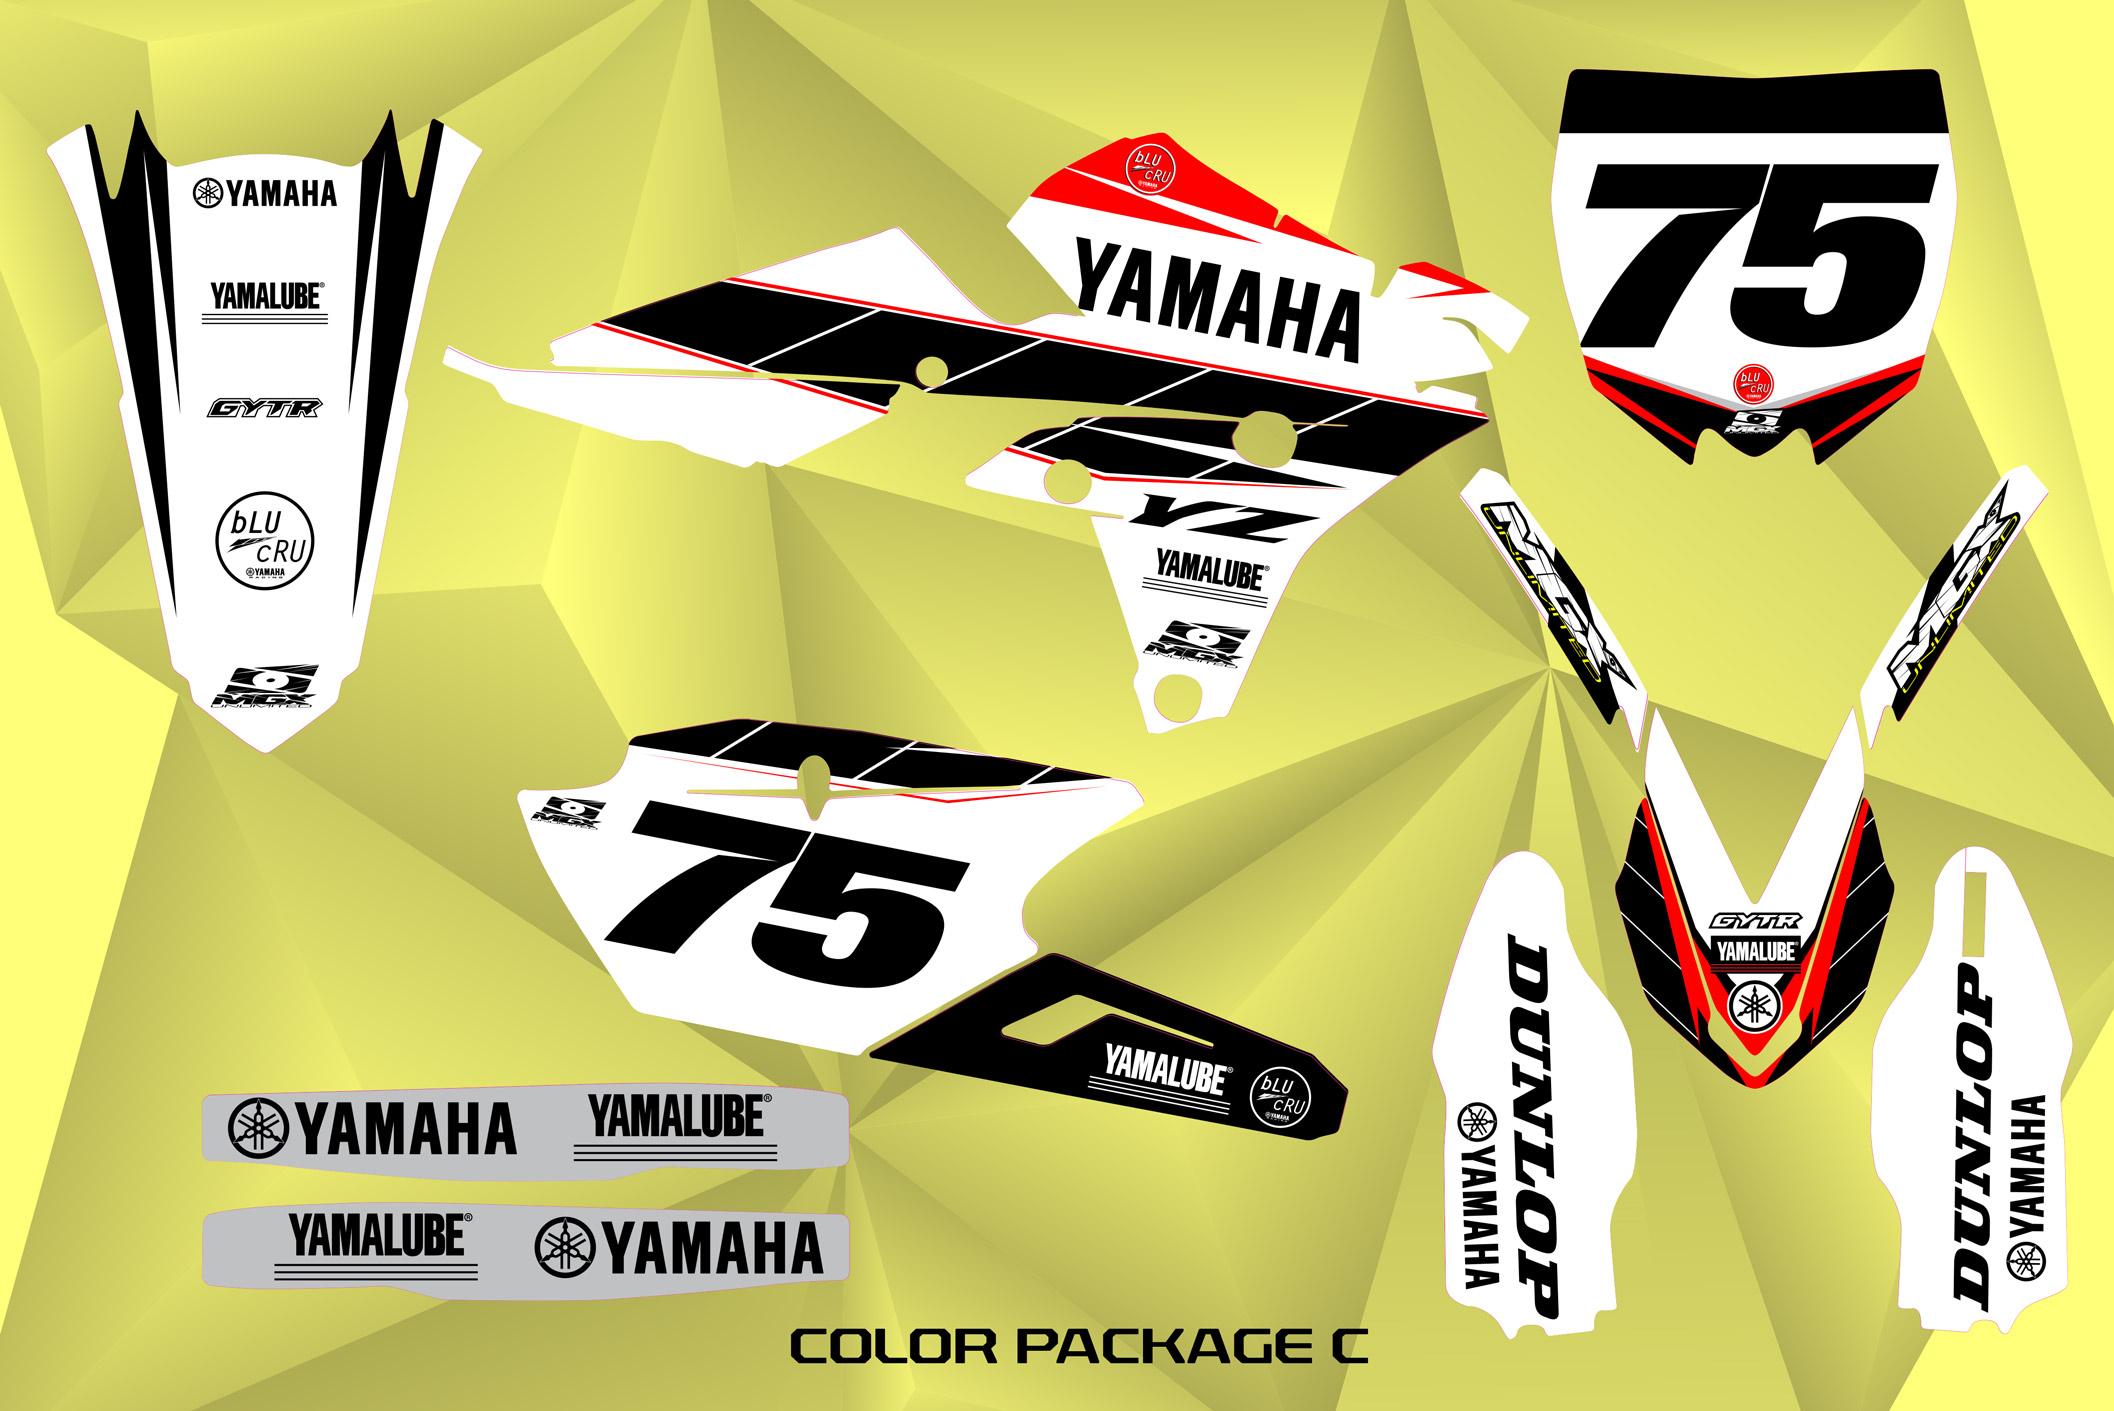 Yamaha clipart yamalube Unlimited SUPERSTOCK SUPERSTOCK YAMAHA KIT